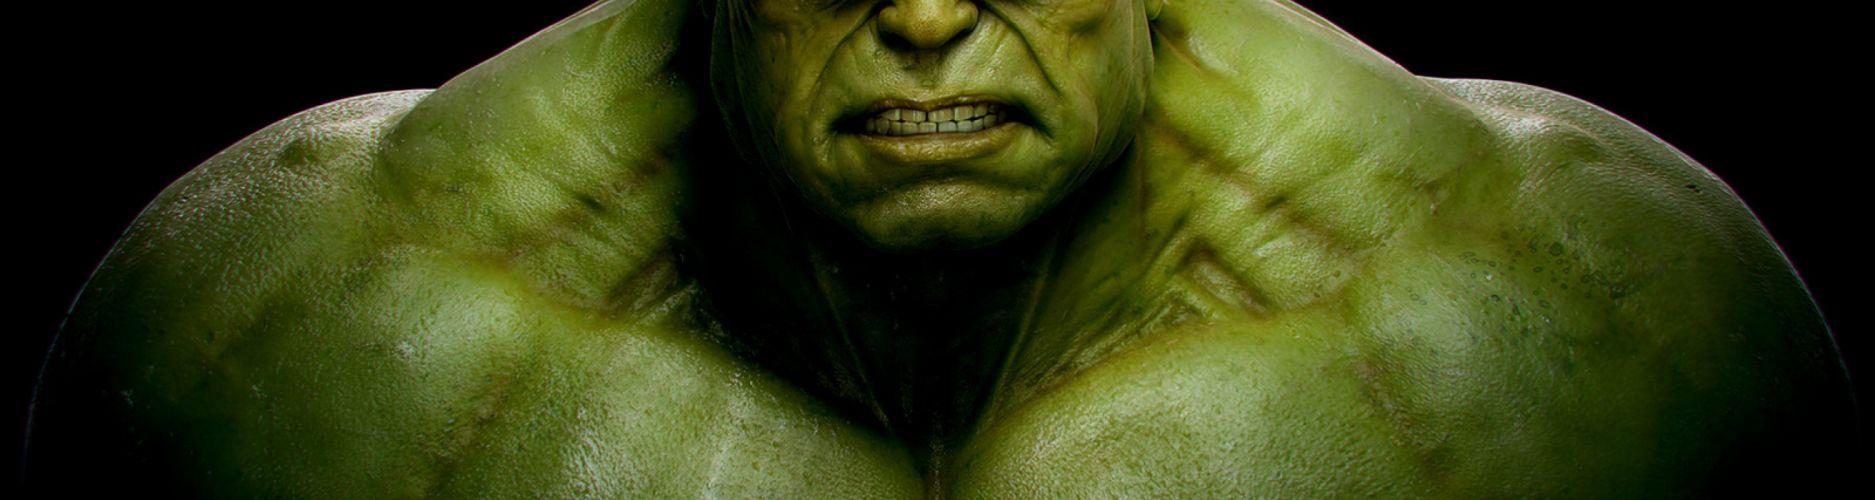 green Hulk (comic character) movies Marvel The Incredible Hulk (Movie) wallpaper